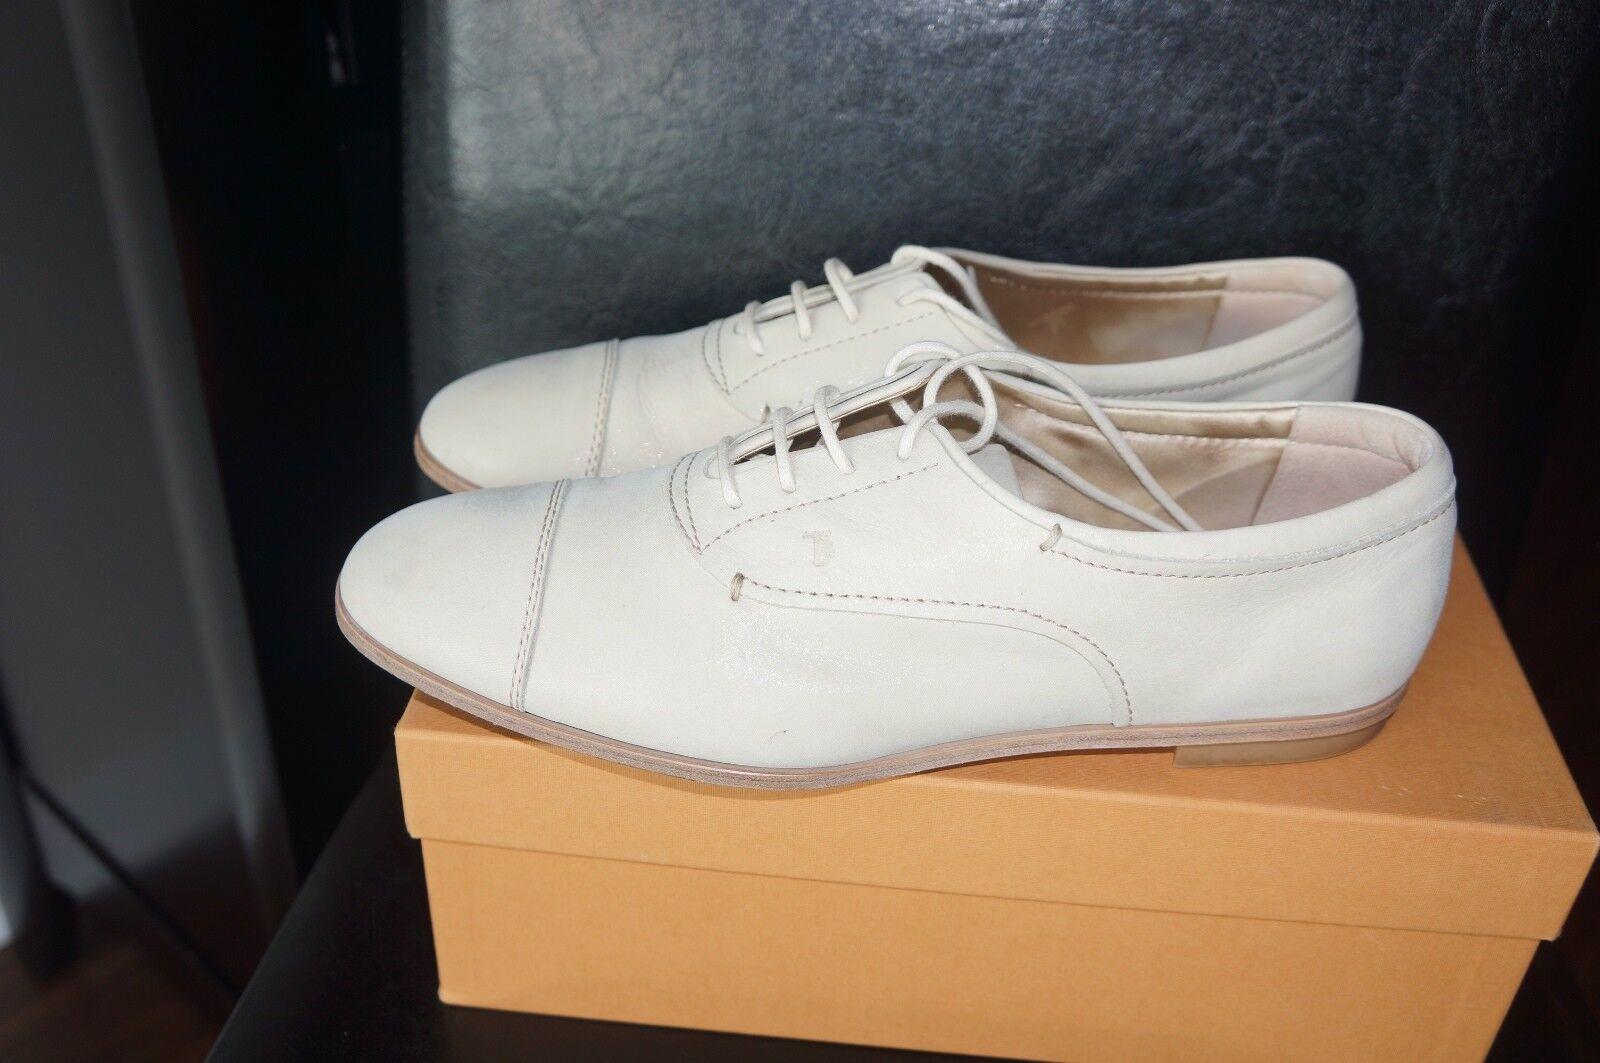 Tod's Ivory Nubuck Leather Lace Up Flat Oxford shoes Sz IT 40 US 9.5